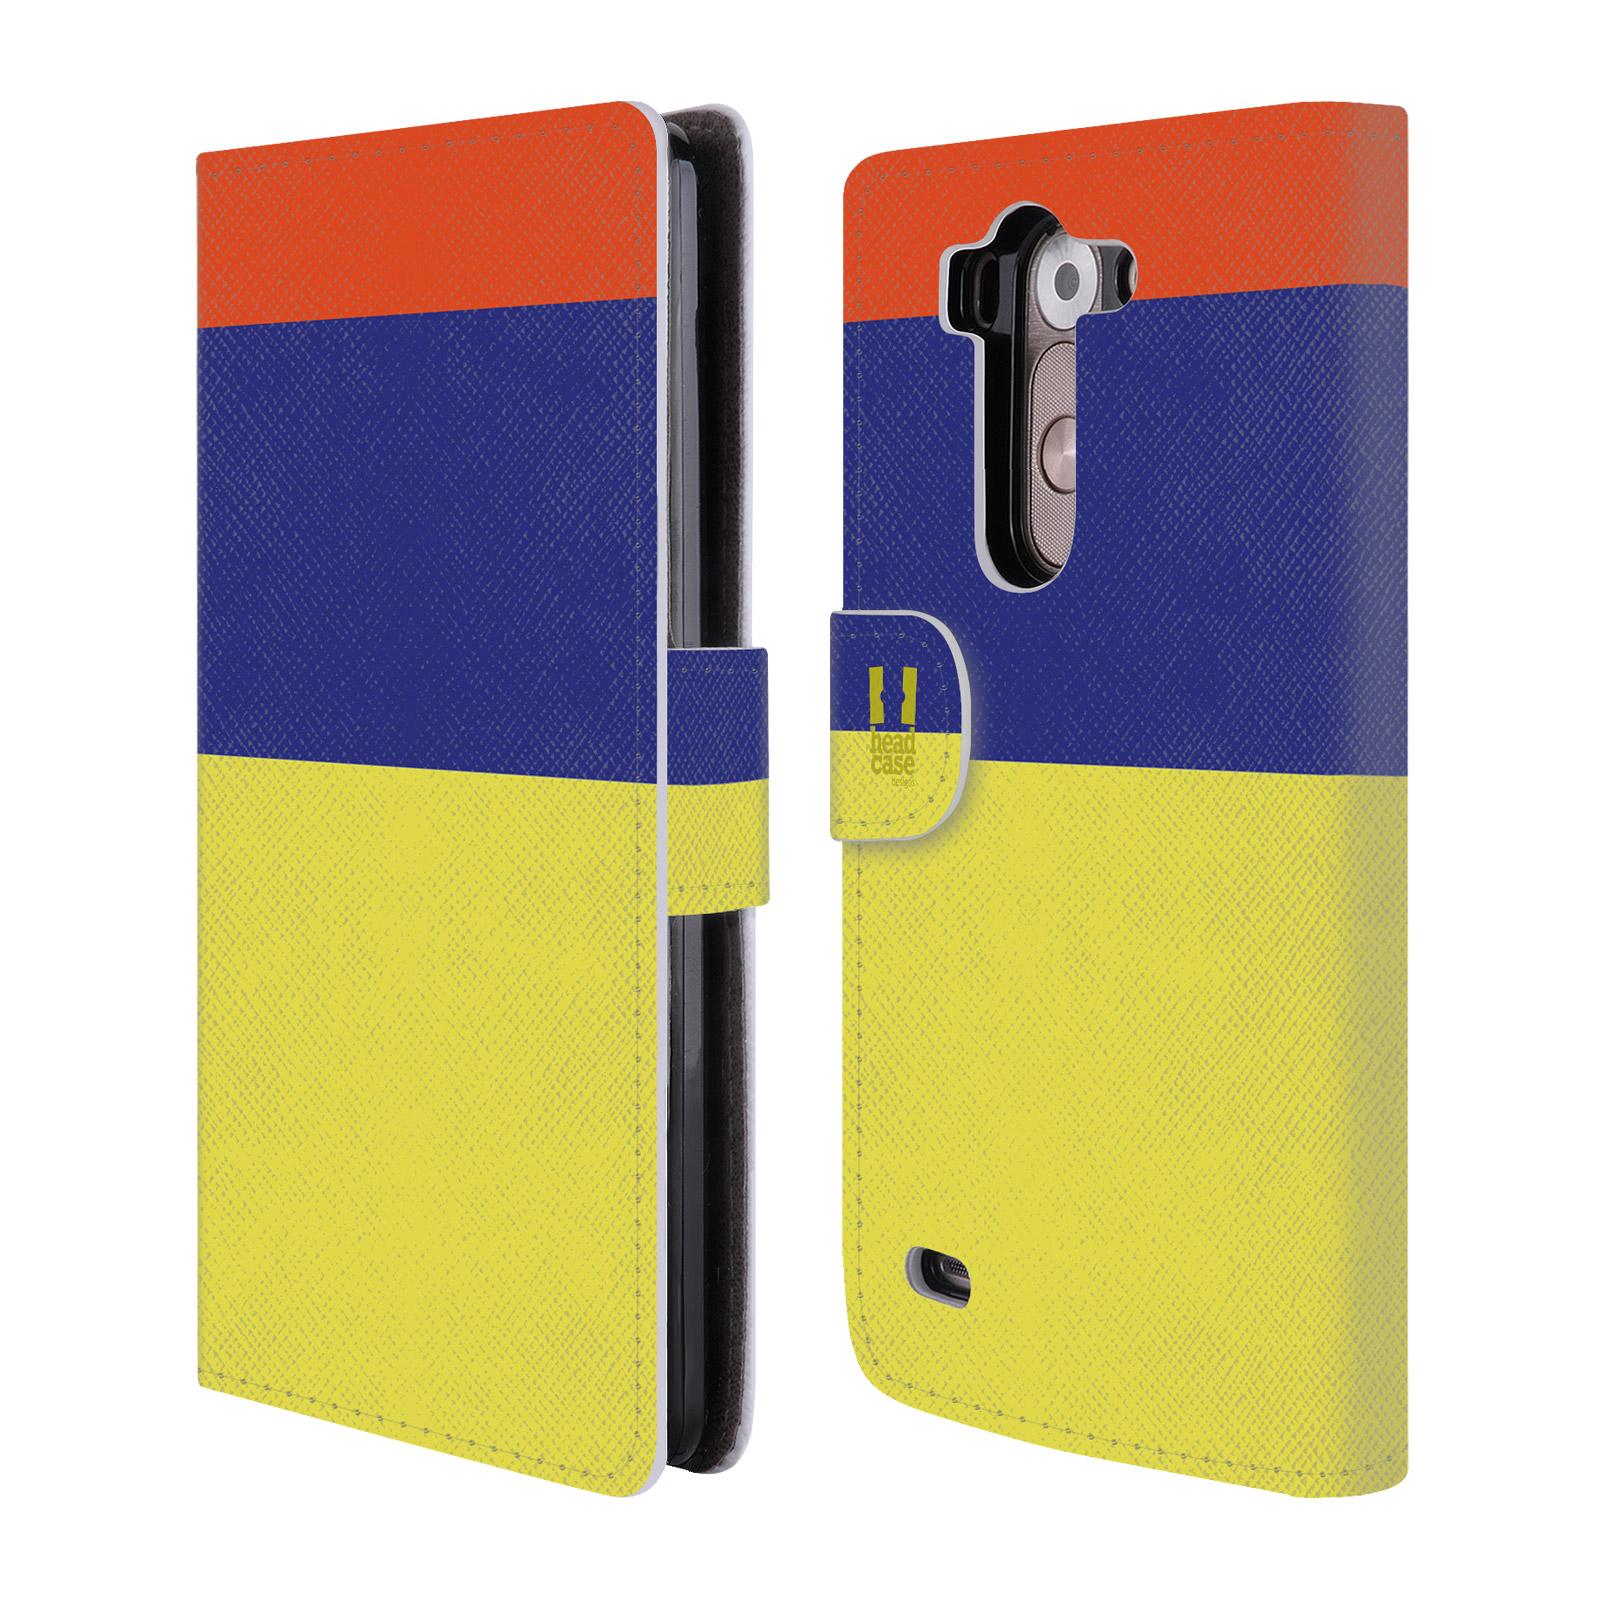 HEAD CASE Flipové pouzdro pro mobil LG G3s barevné tvary žlutá, modrá, červená